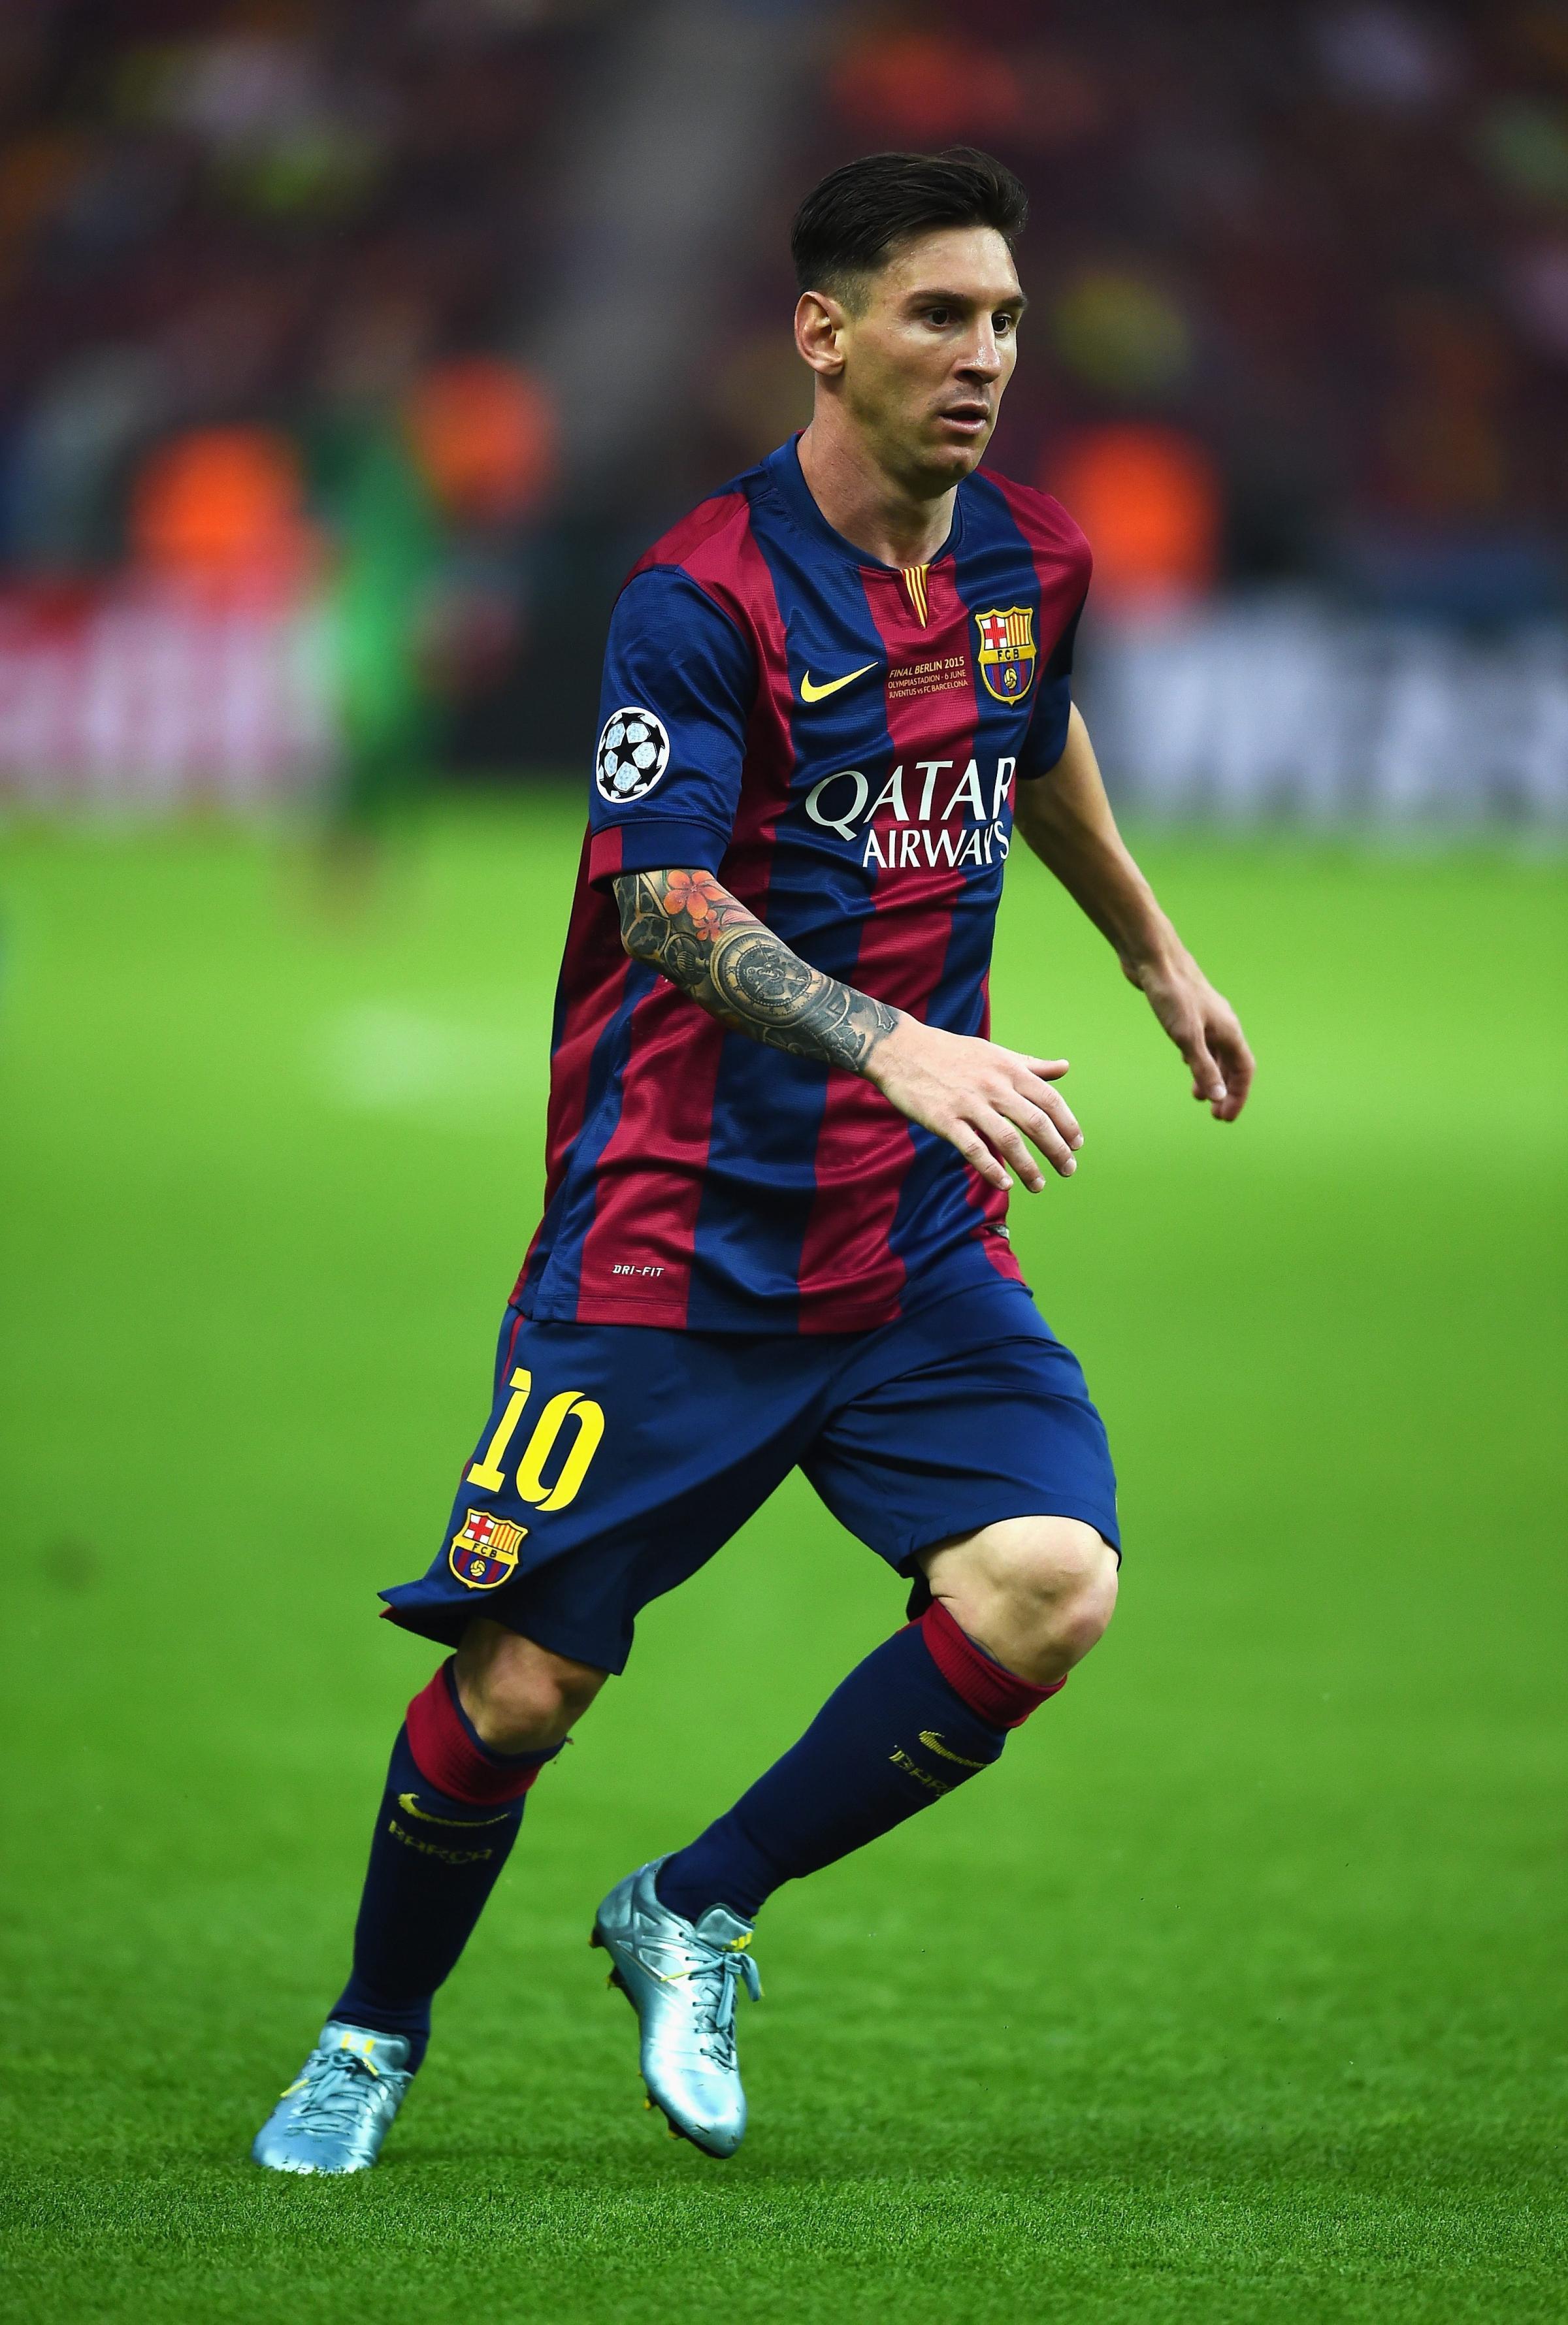 Messi Uefa Champions League 2015 2400x3559 Download Hd Wallpaper Wallpapertip